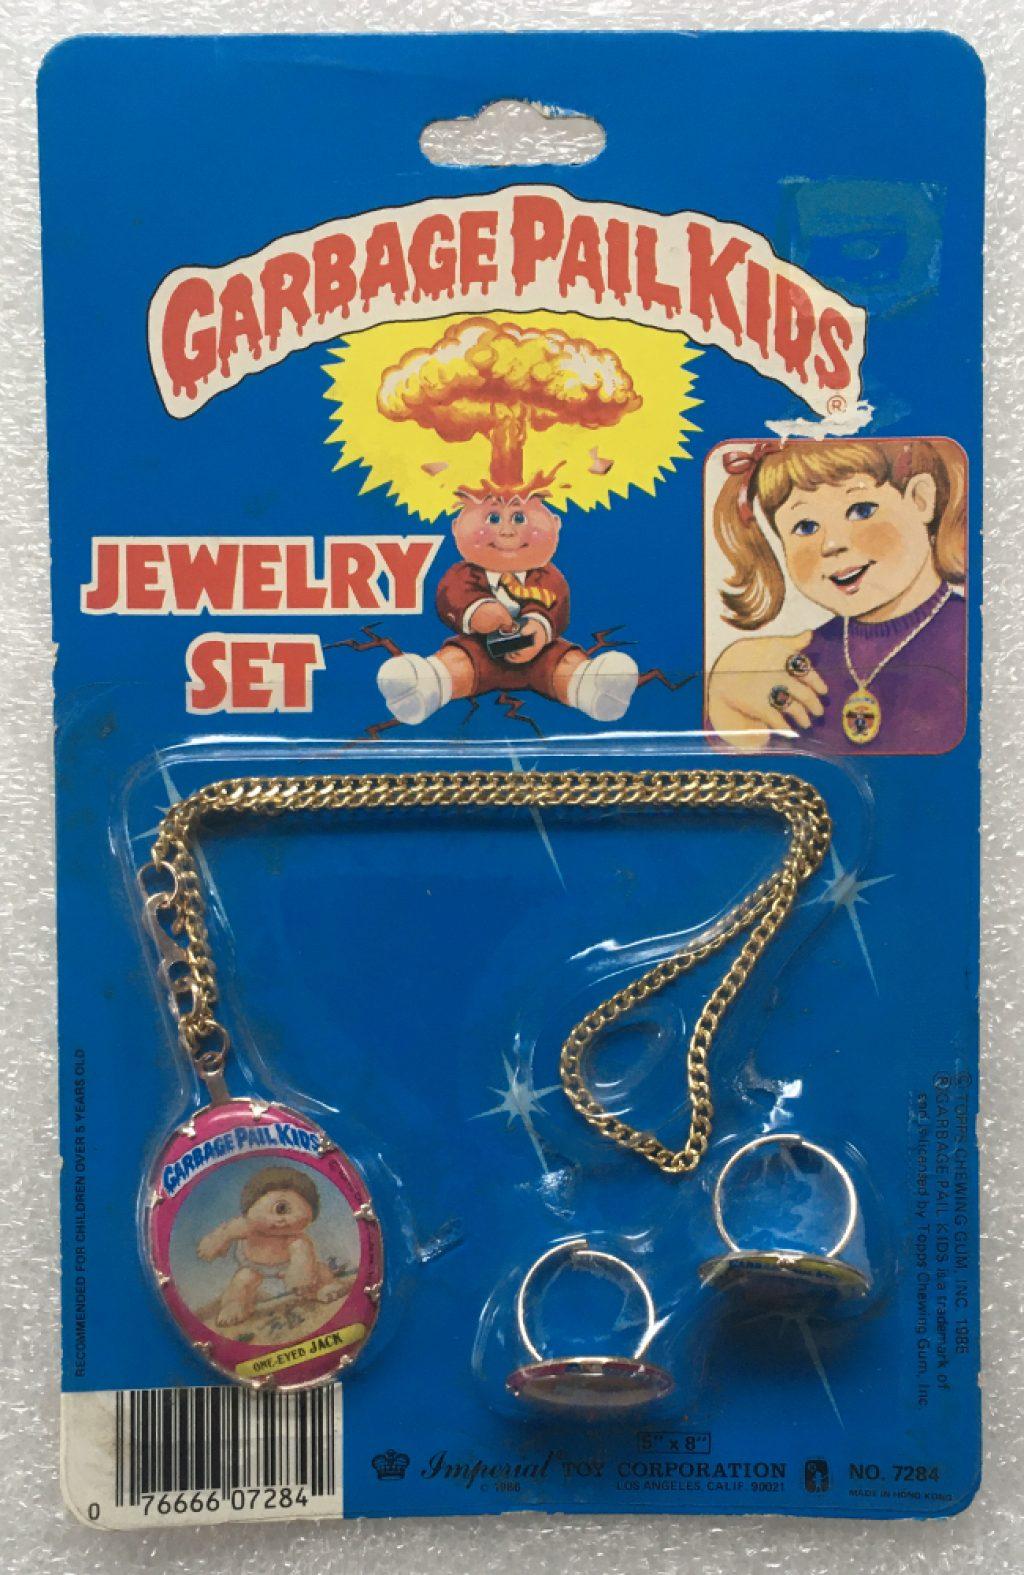 1985 Garbage Pail Kids Jewelry Set - One-Eyed Jack, Creepy Carol & Sweat Brett